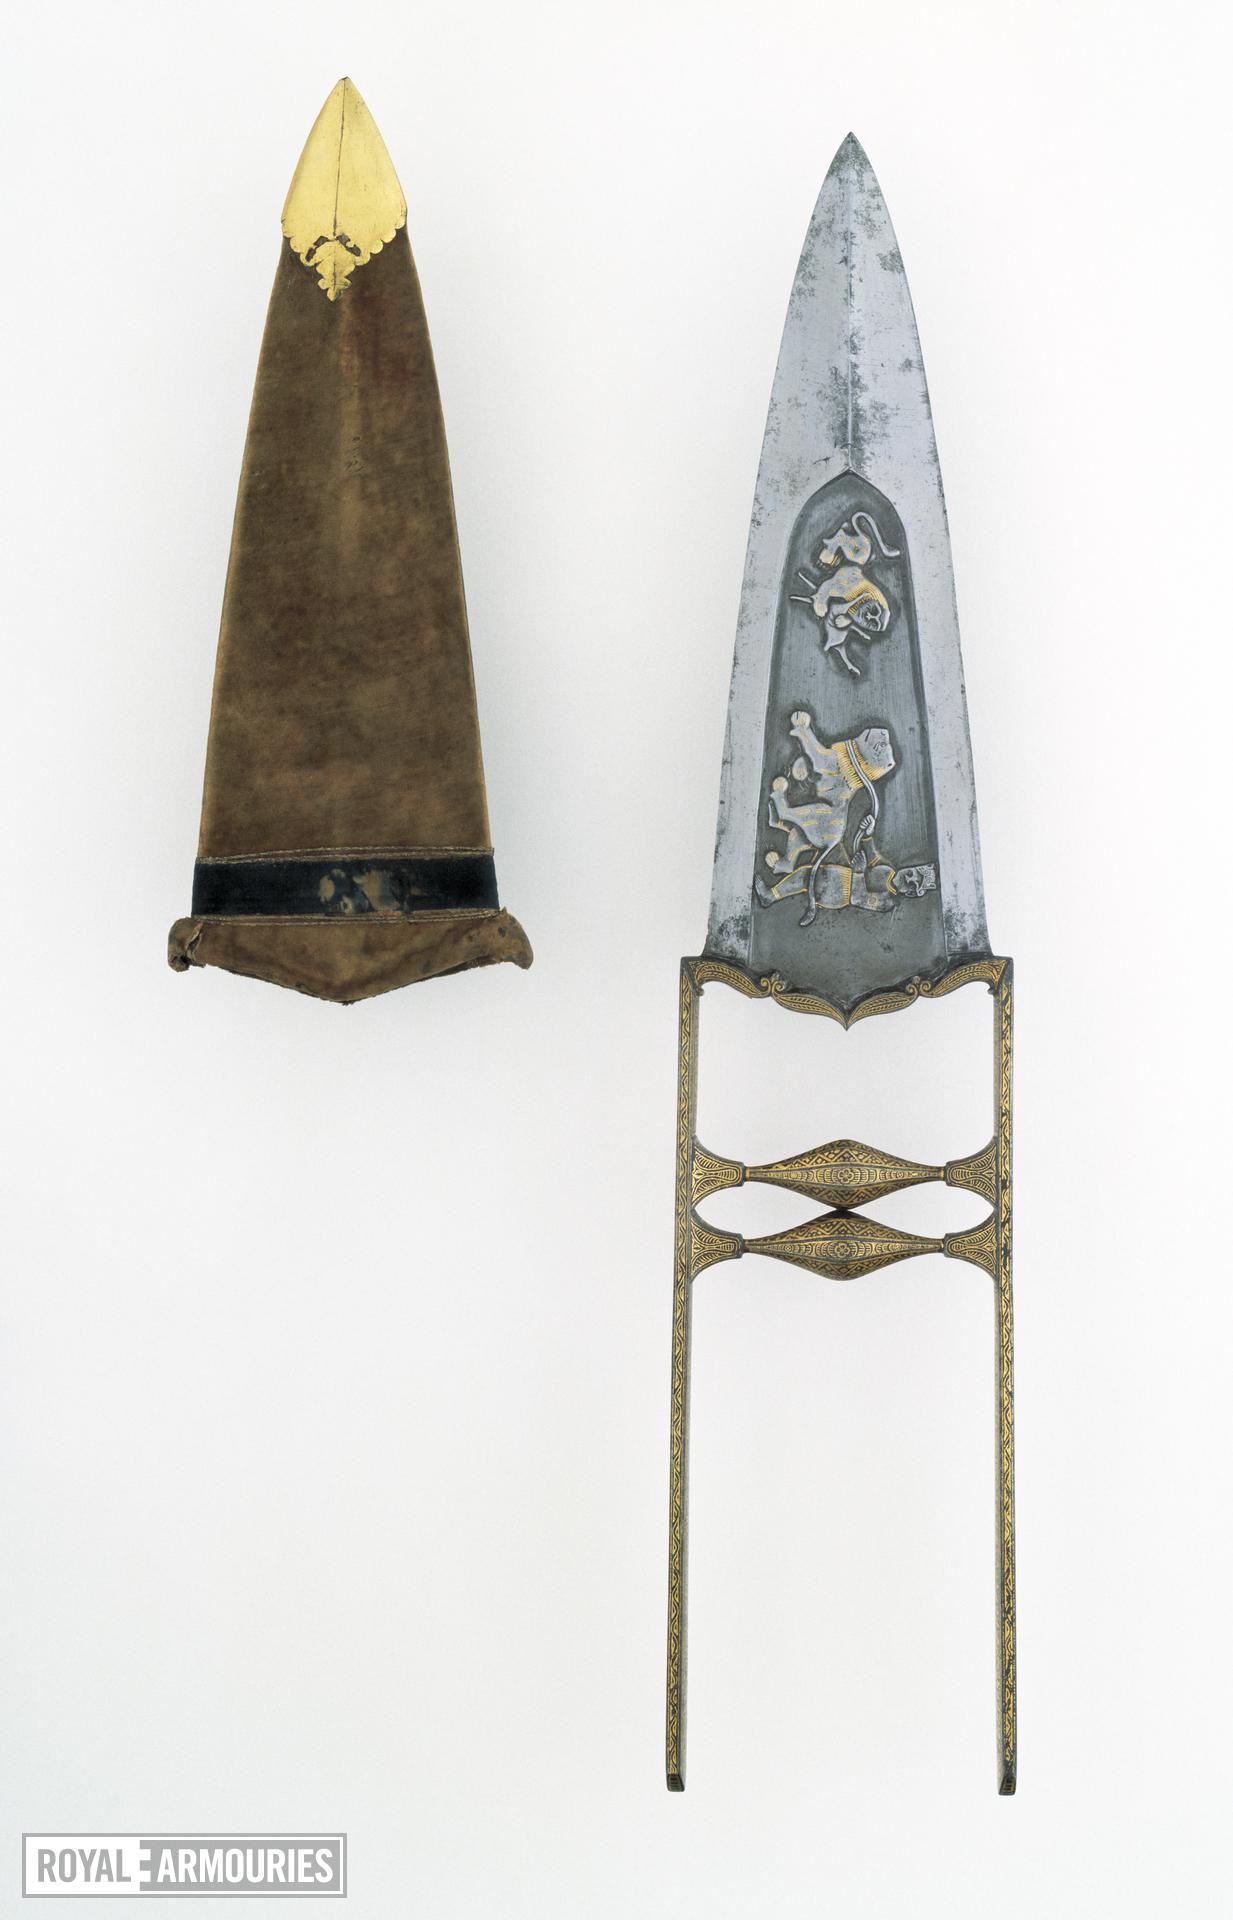 Dagger (katar) and scabbard Dagger (katar) and scabbard, India, early 19th century